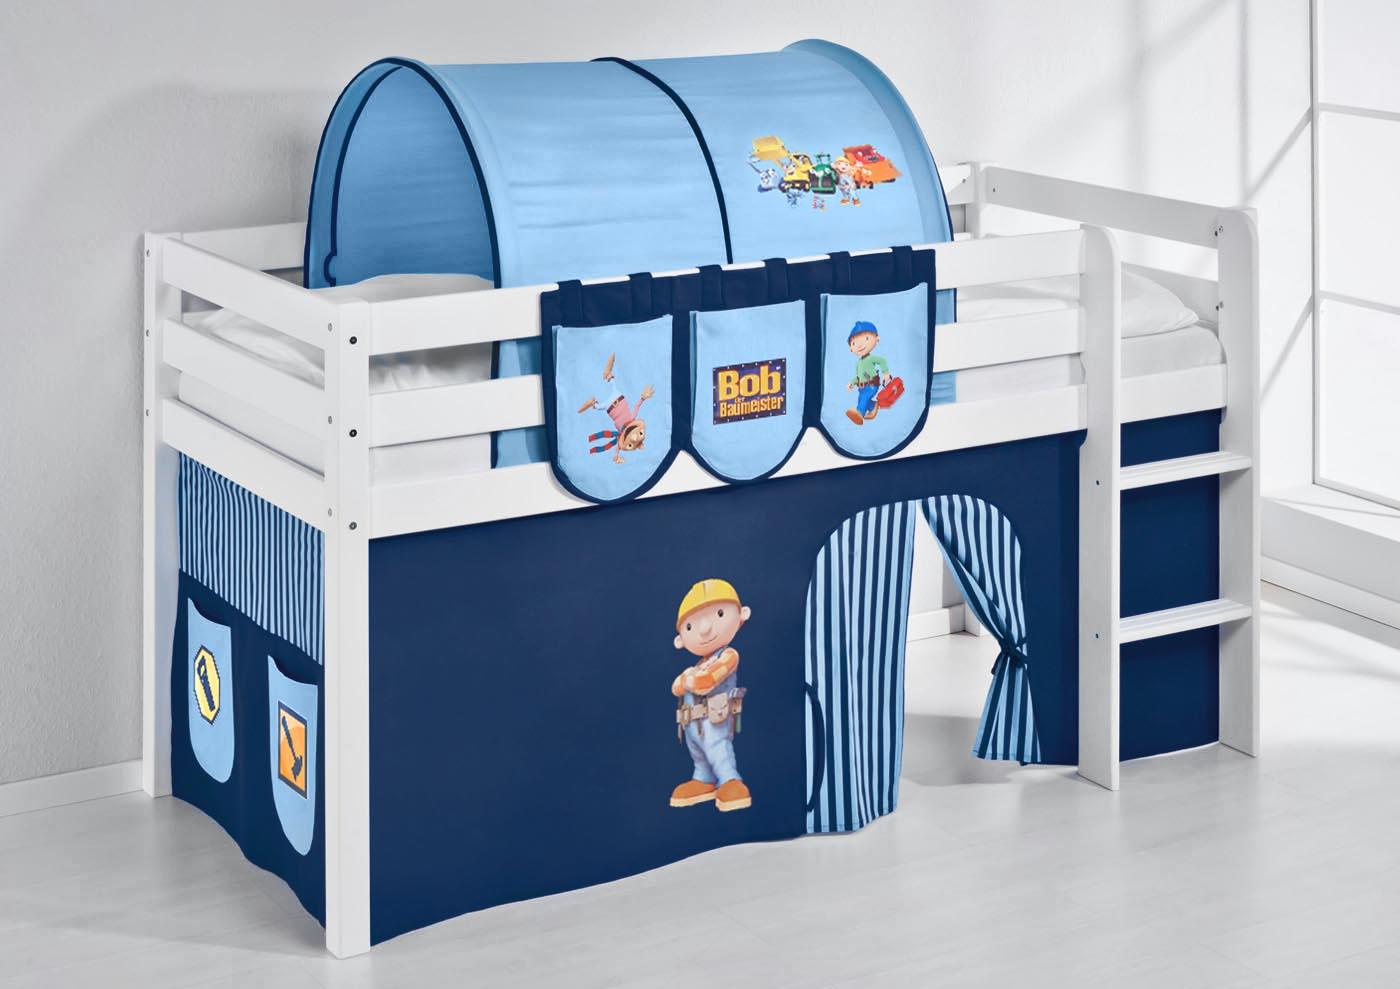 spielbett hochbett kinderbett jelle mit vorhang neu. Black Bedroom Furniture Sets. Home Design Ideas